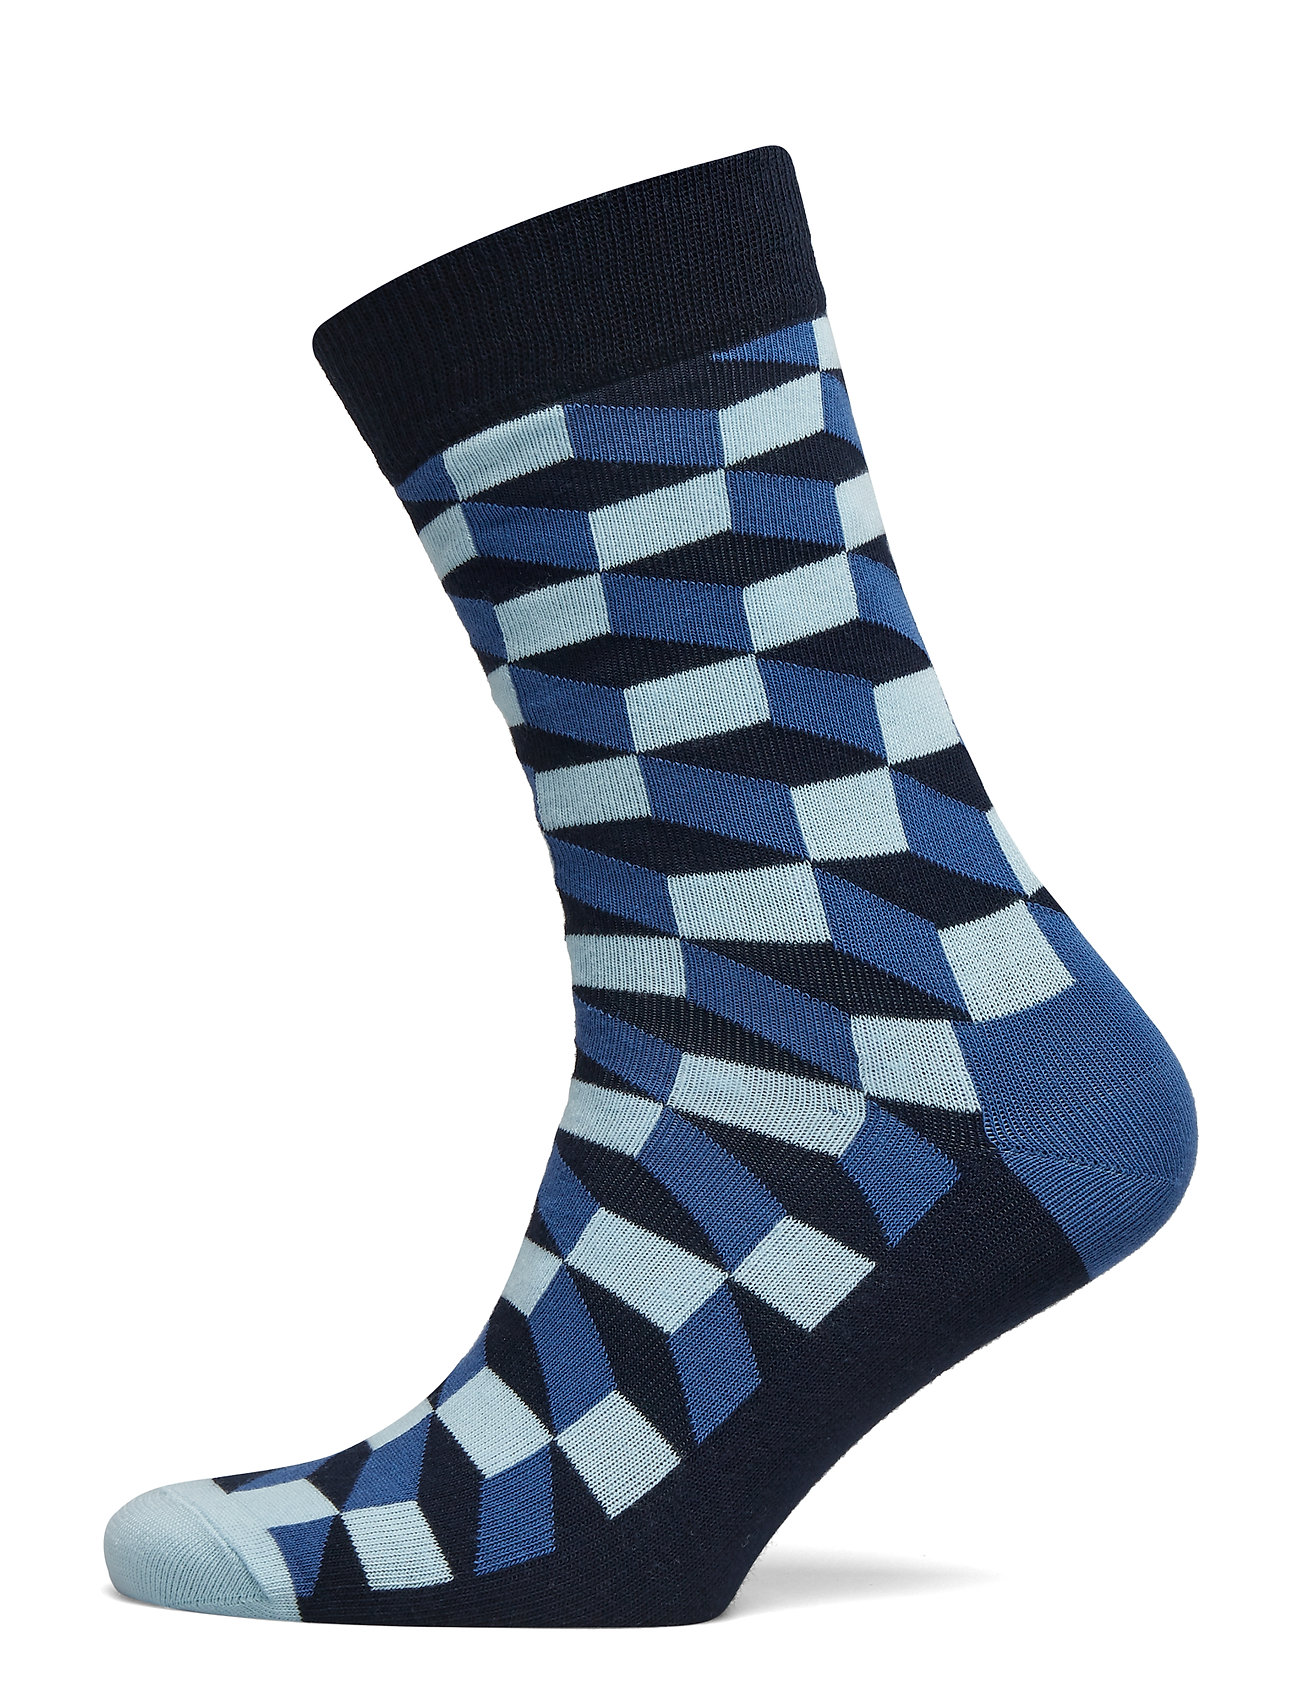 Socks SockblueHappy Optic Socks Optic Socks Optic Filled Filled Filled SockblueHappy SockblueHappy SockblueHappy Filled Optic 1Kc3TlFJ